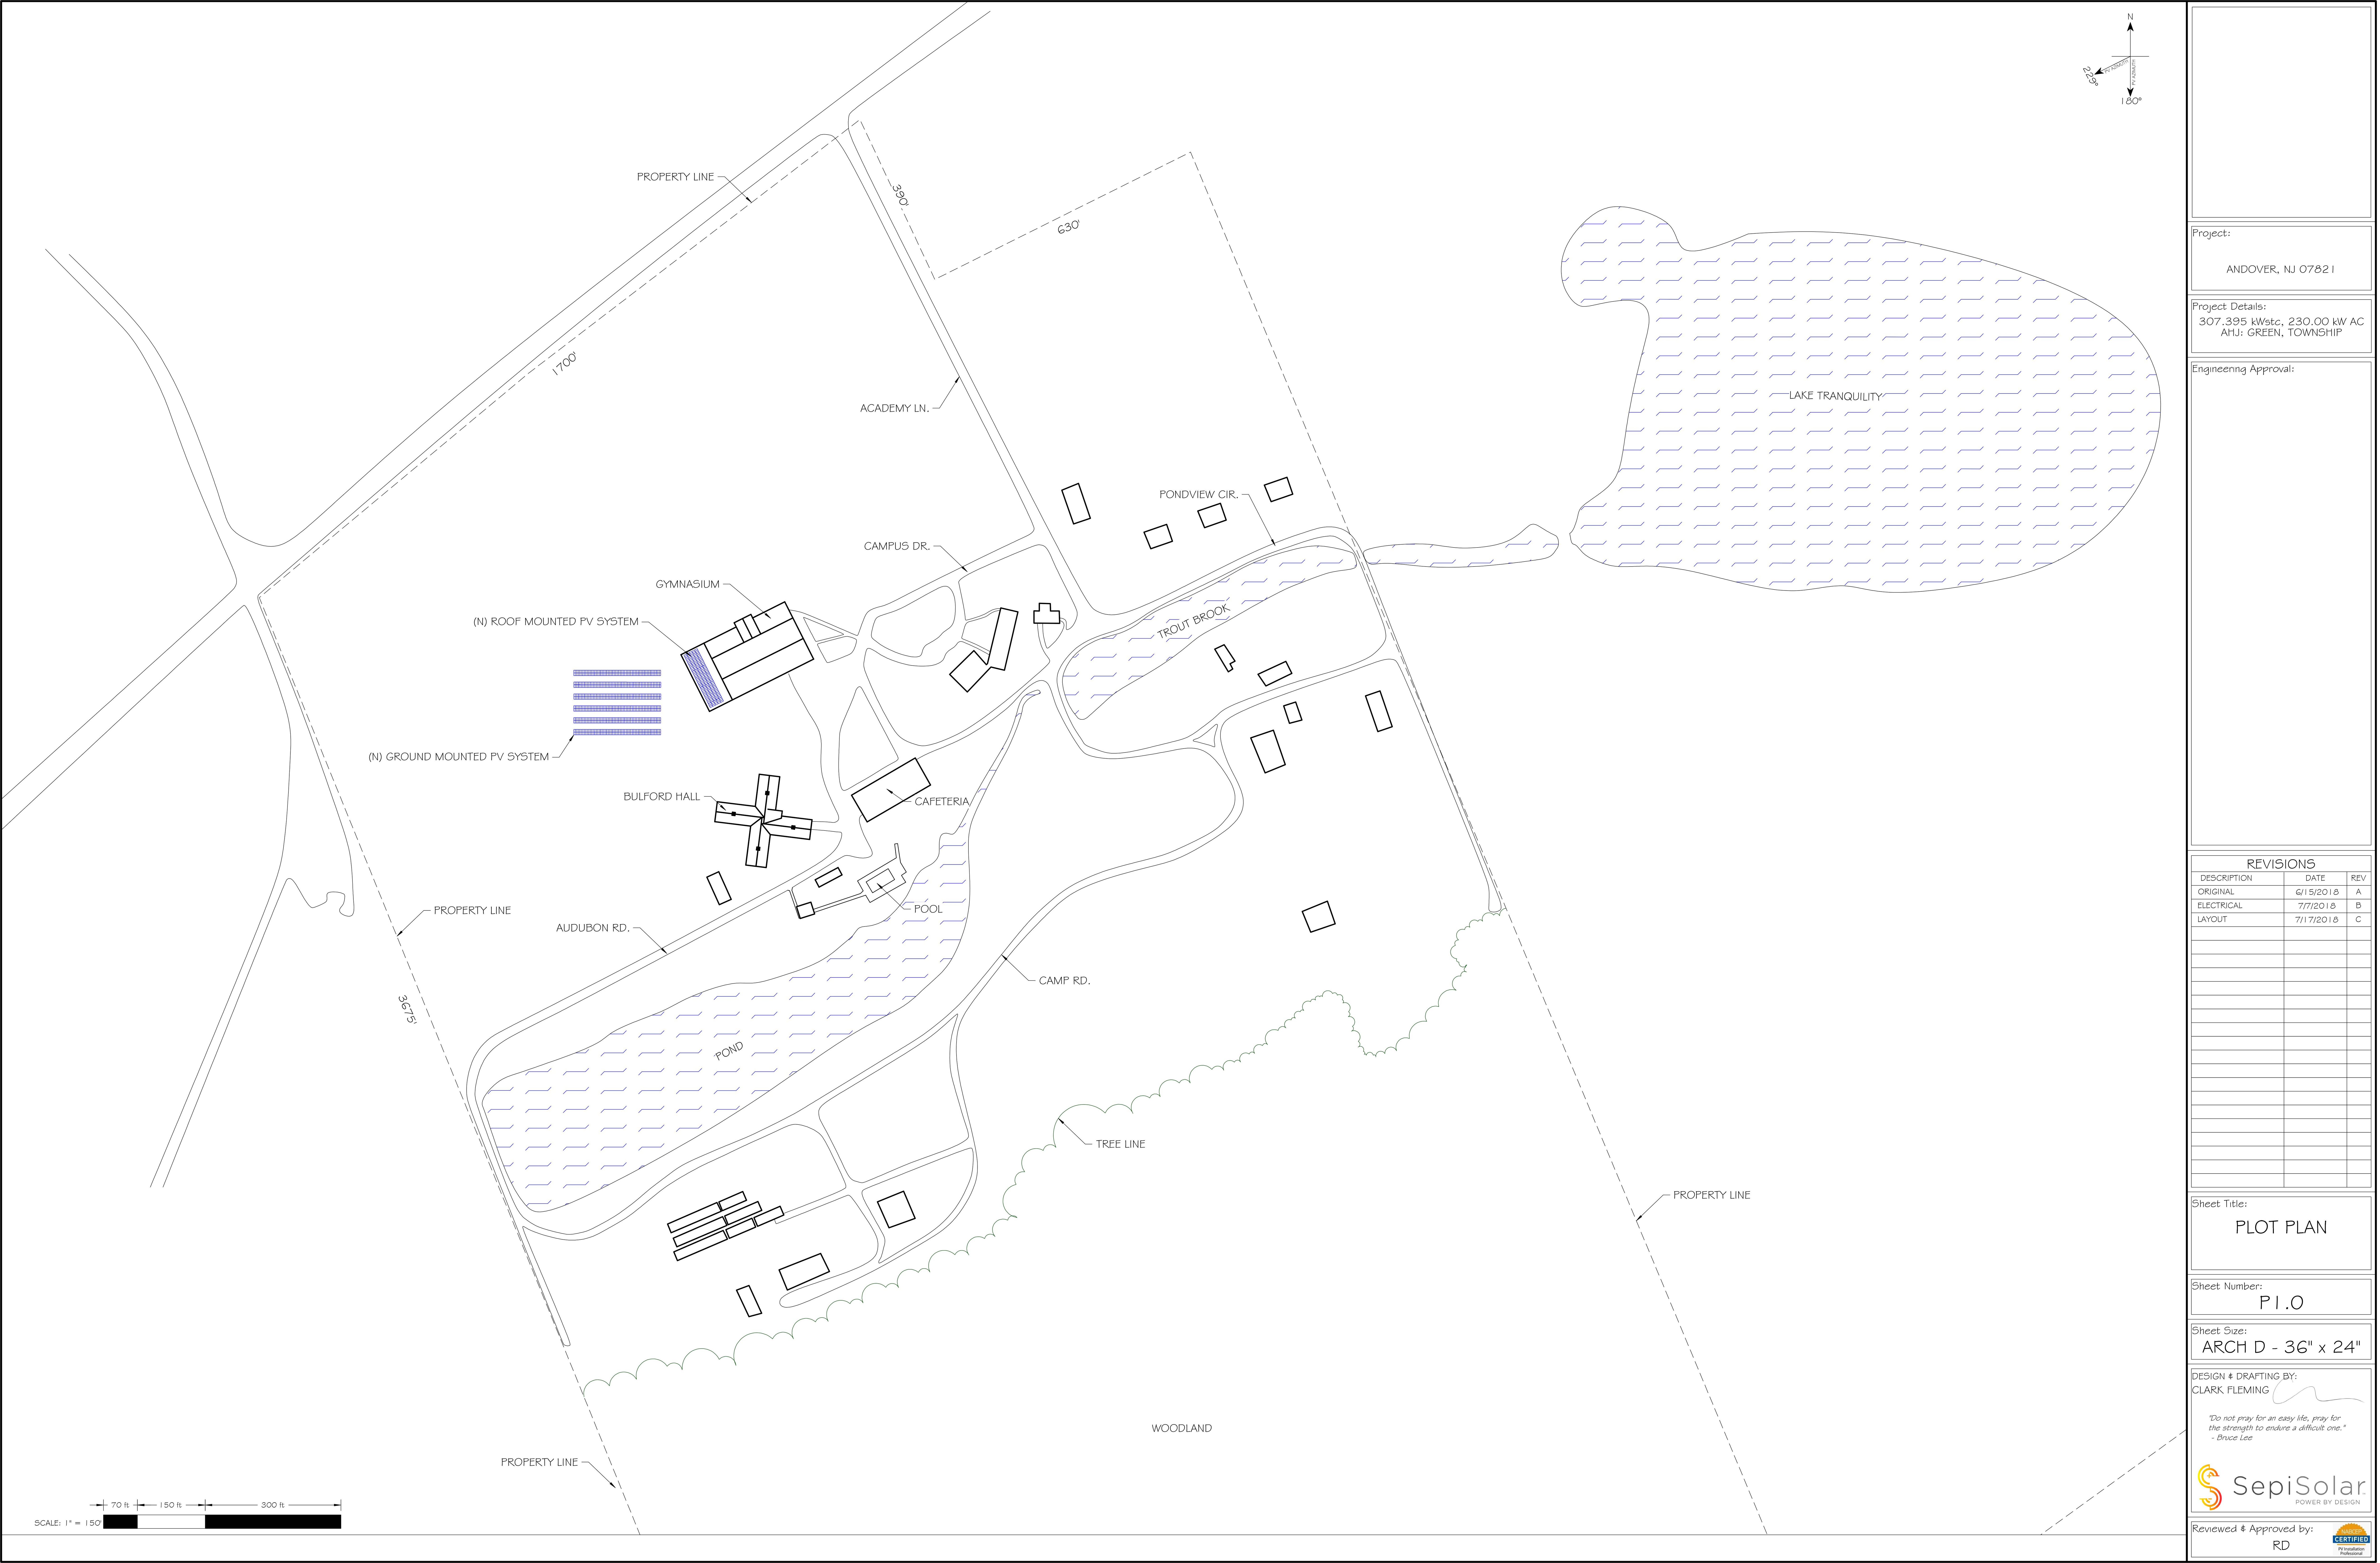 307.4 kW Commercial Solar Design | SepiSolar